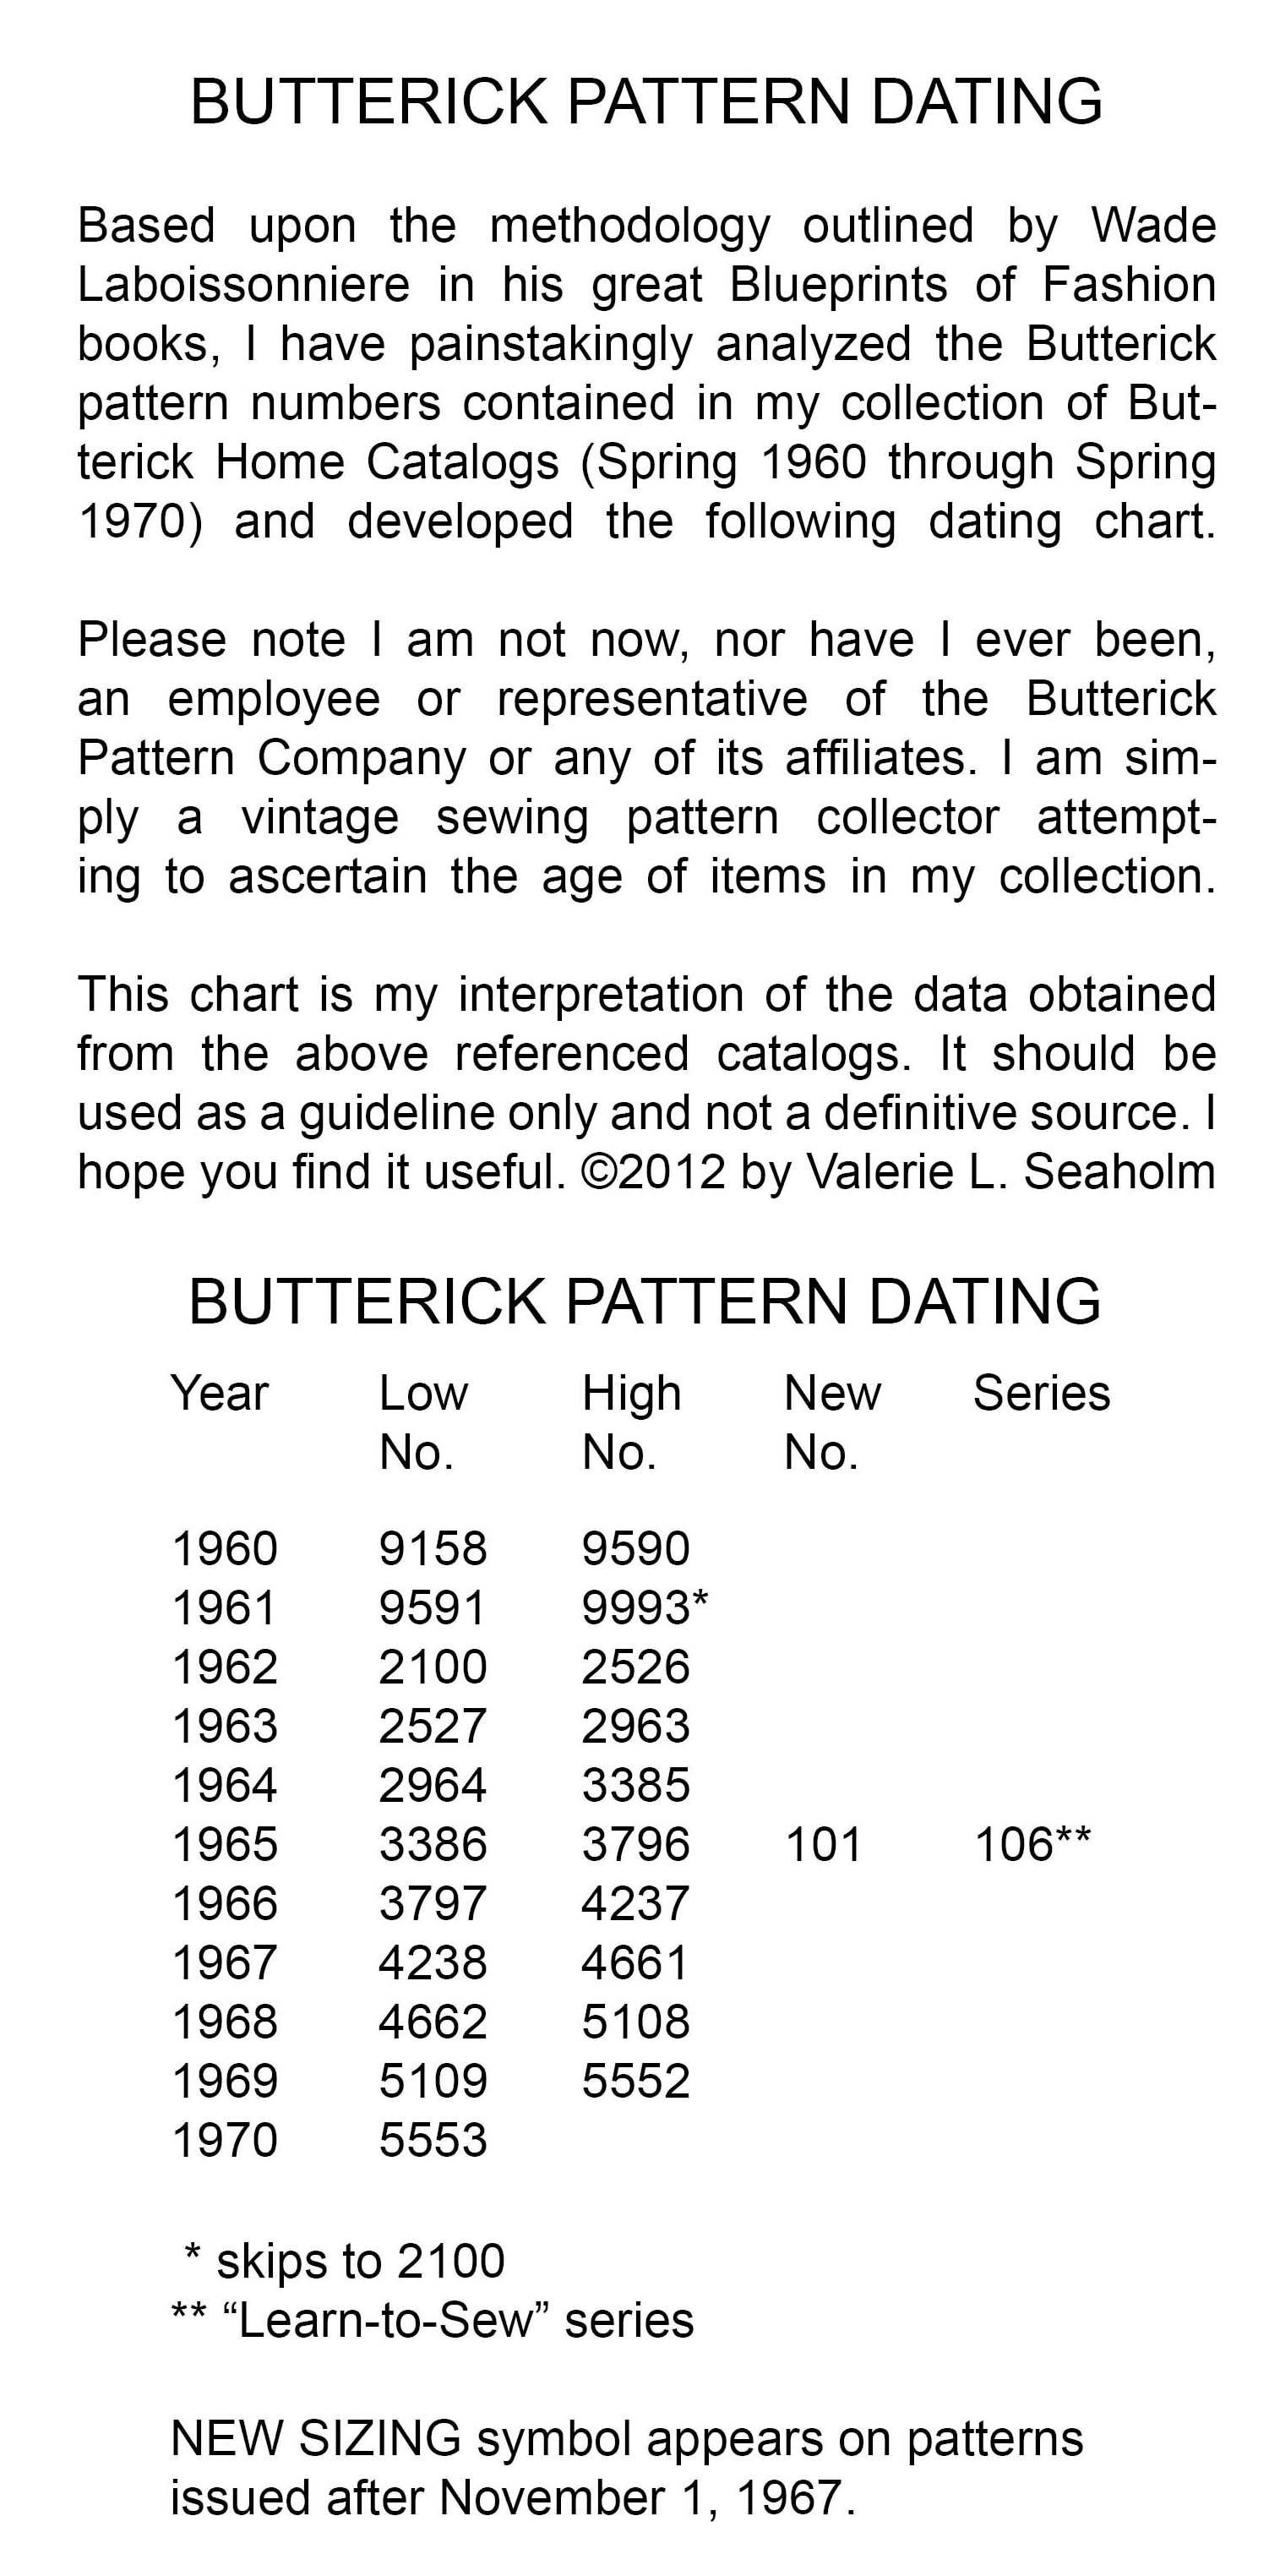 Butterick pattern dating